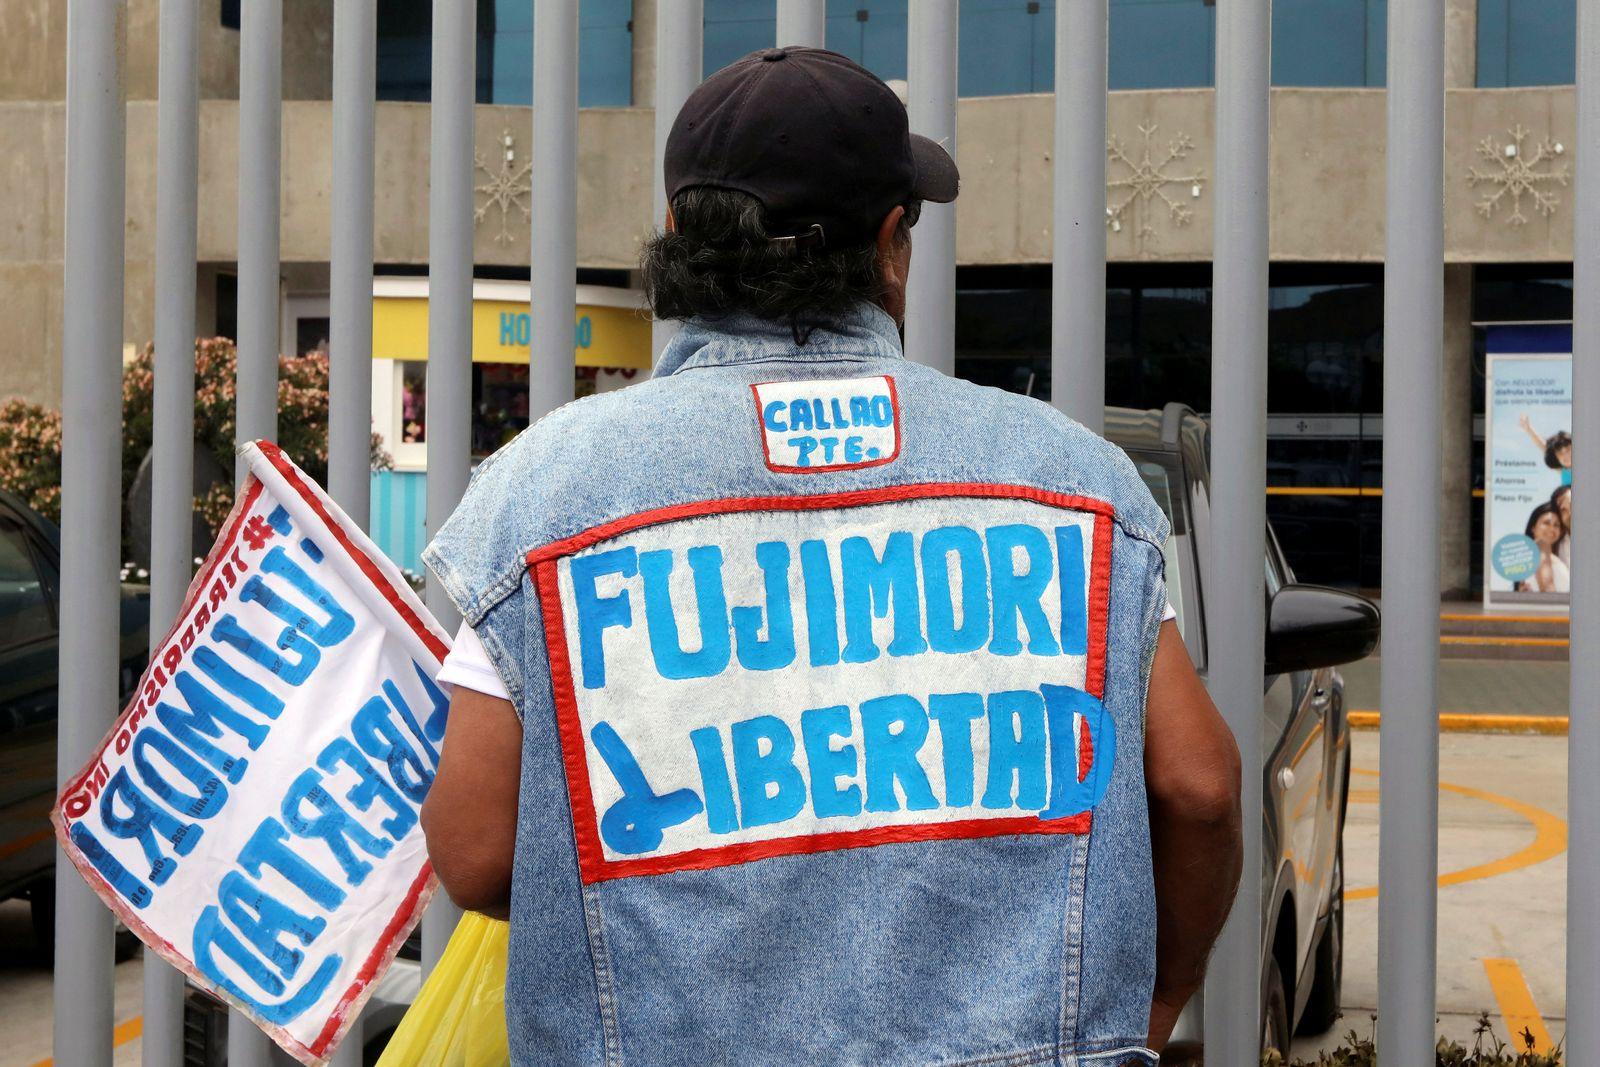 Fujimori Peru